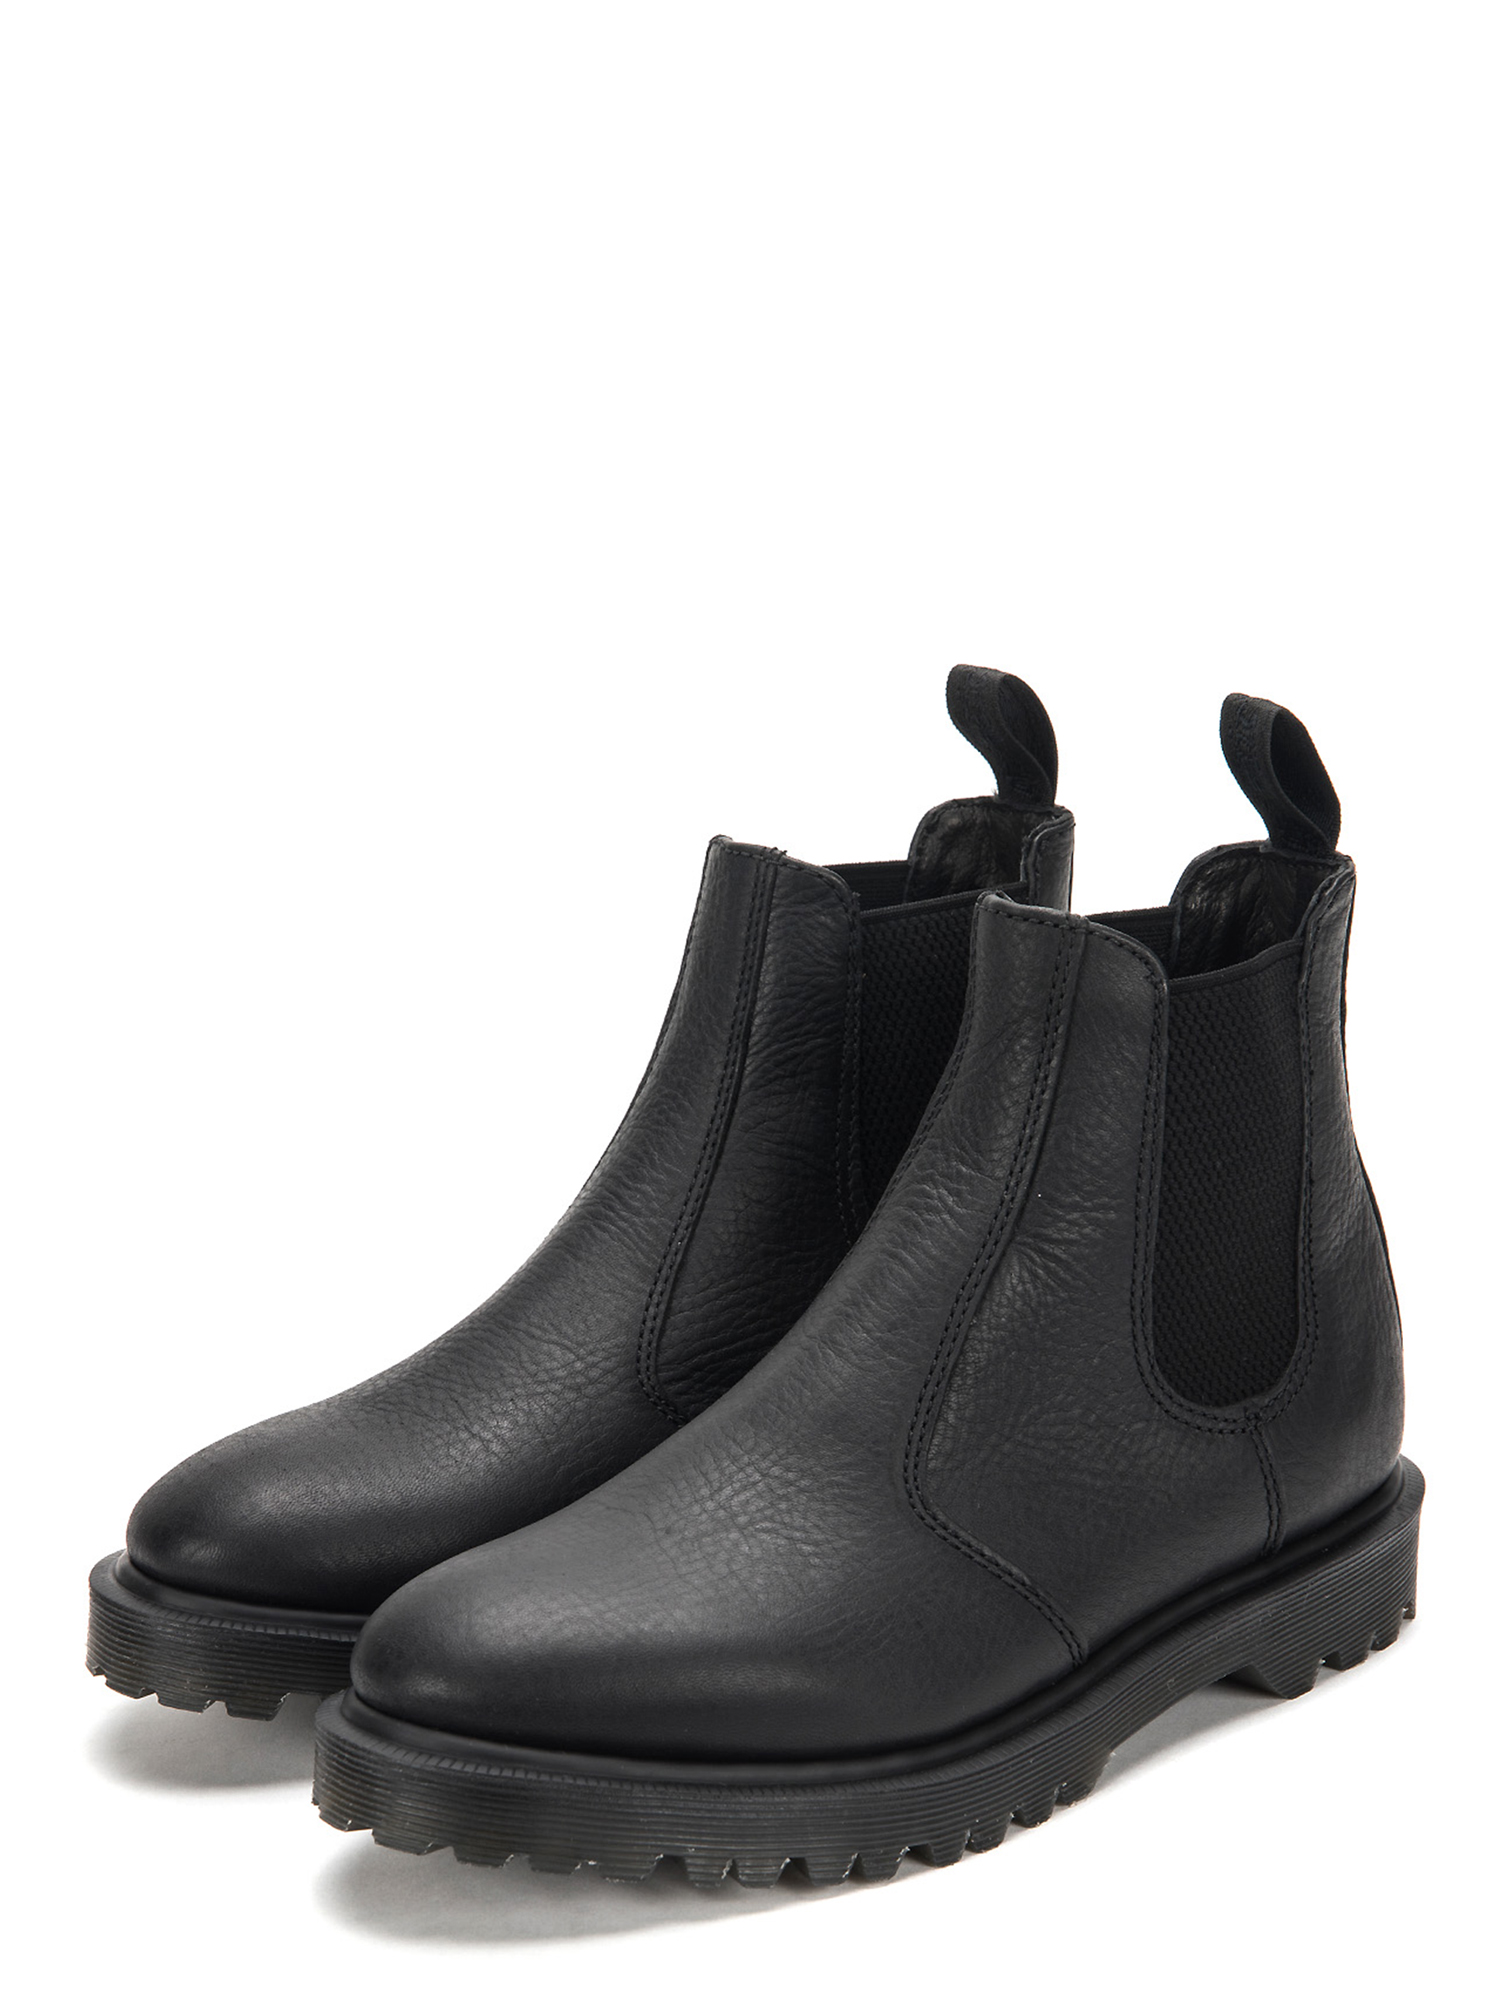 Dr. Martens 2976 Inuck Chelsea Boots 16768001 Black by Dr. Martens